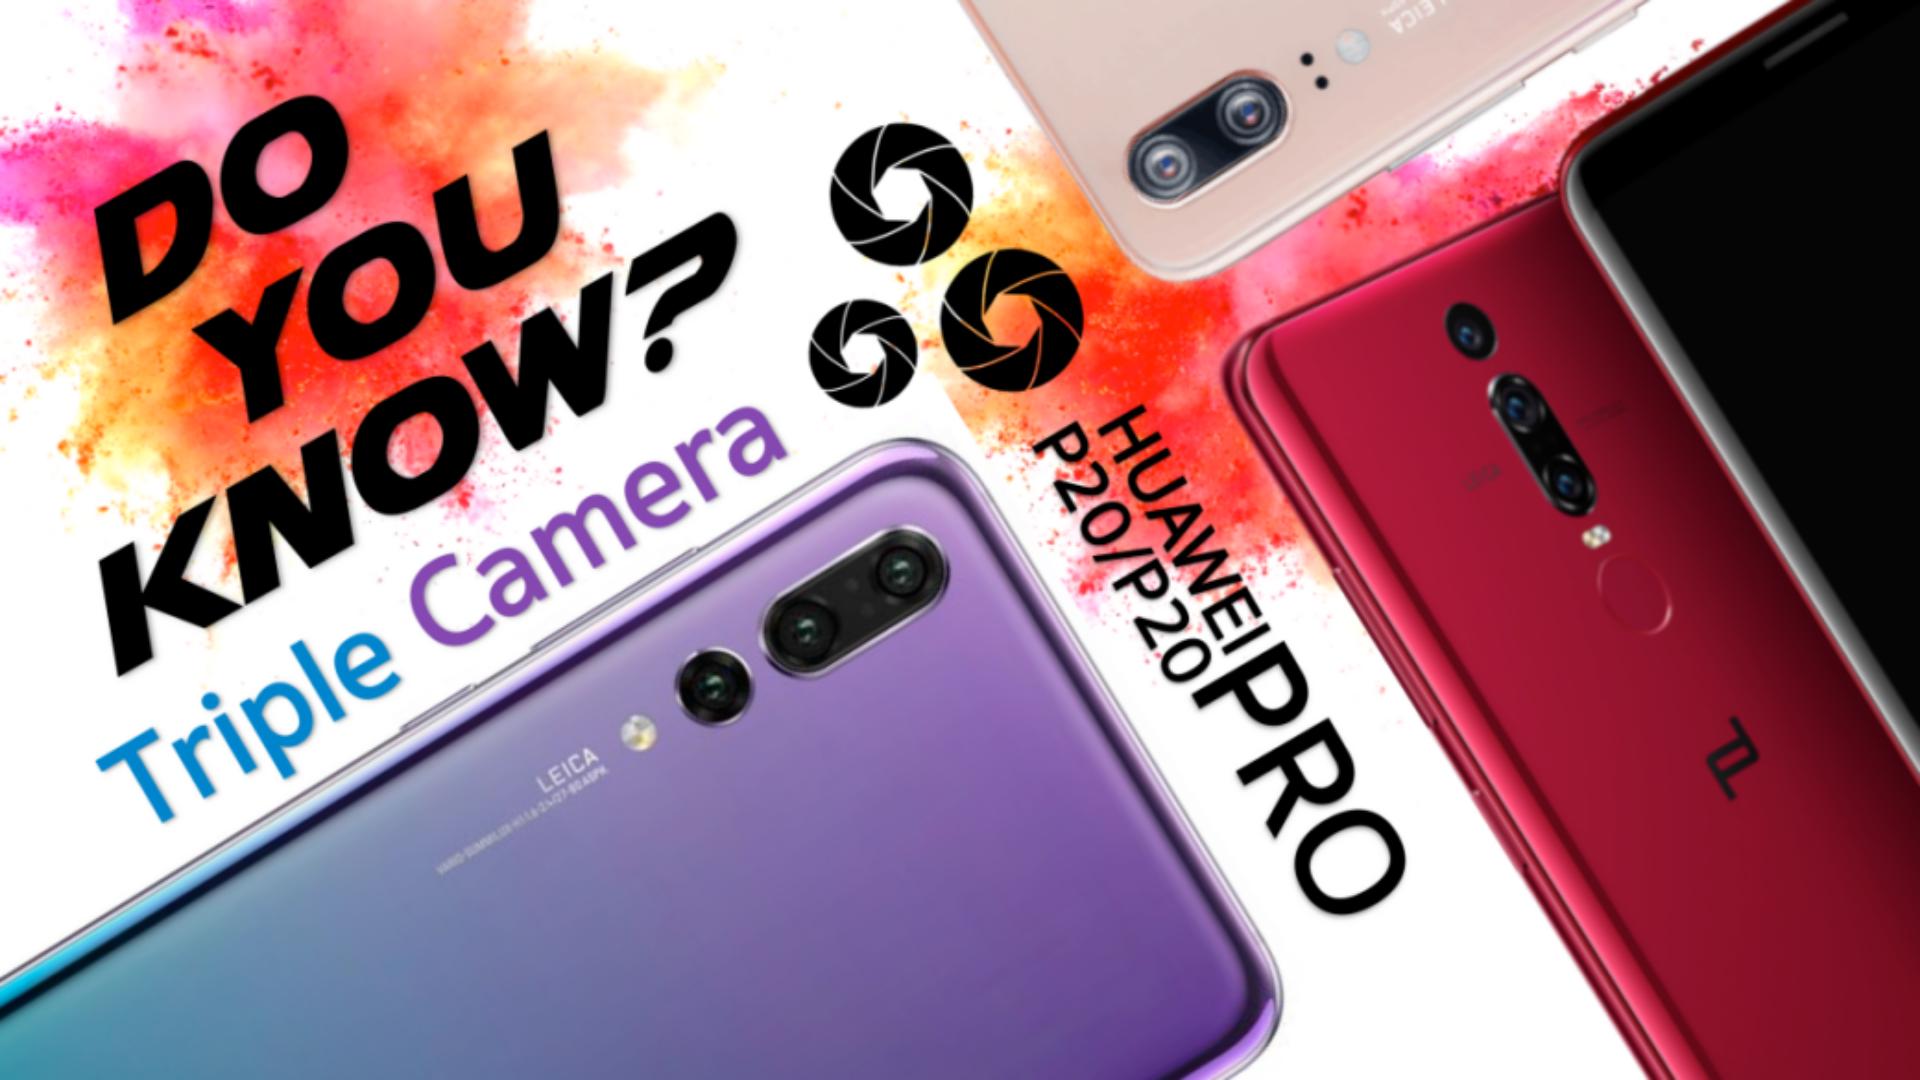 Do you know Huawei P20 Pro Triple camera